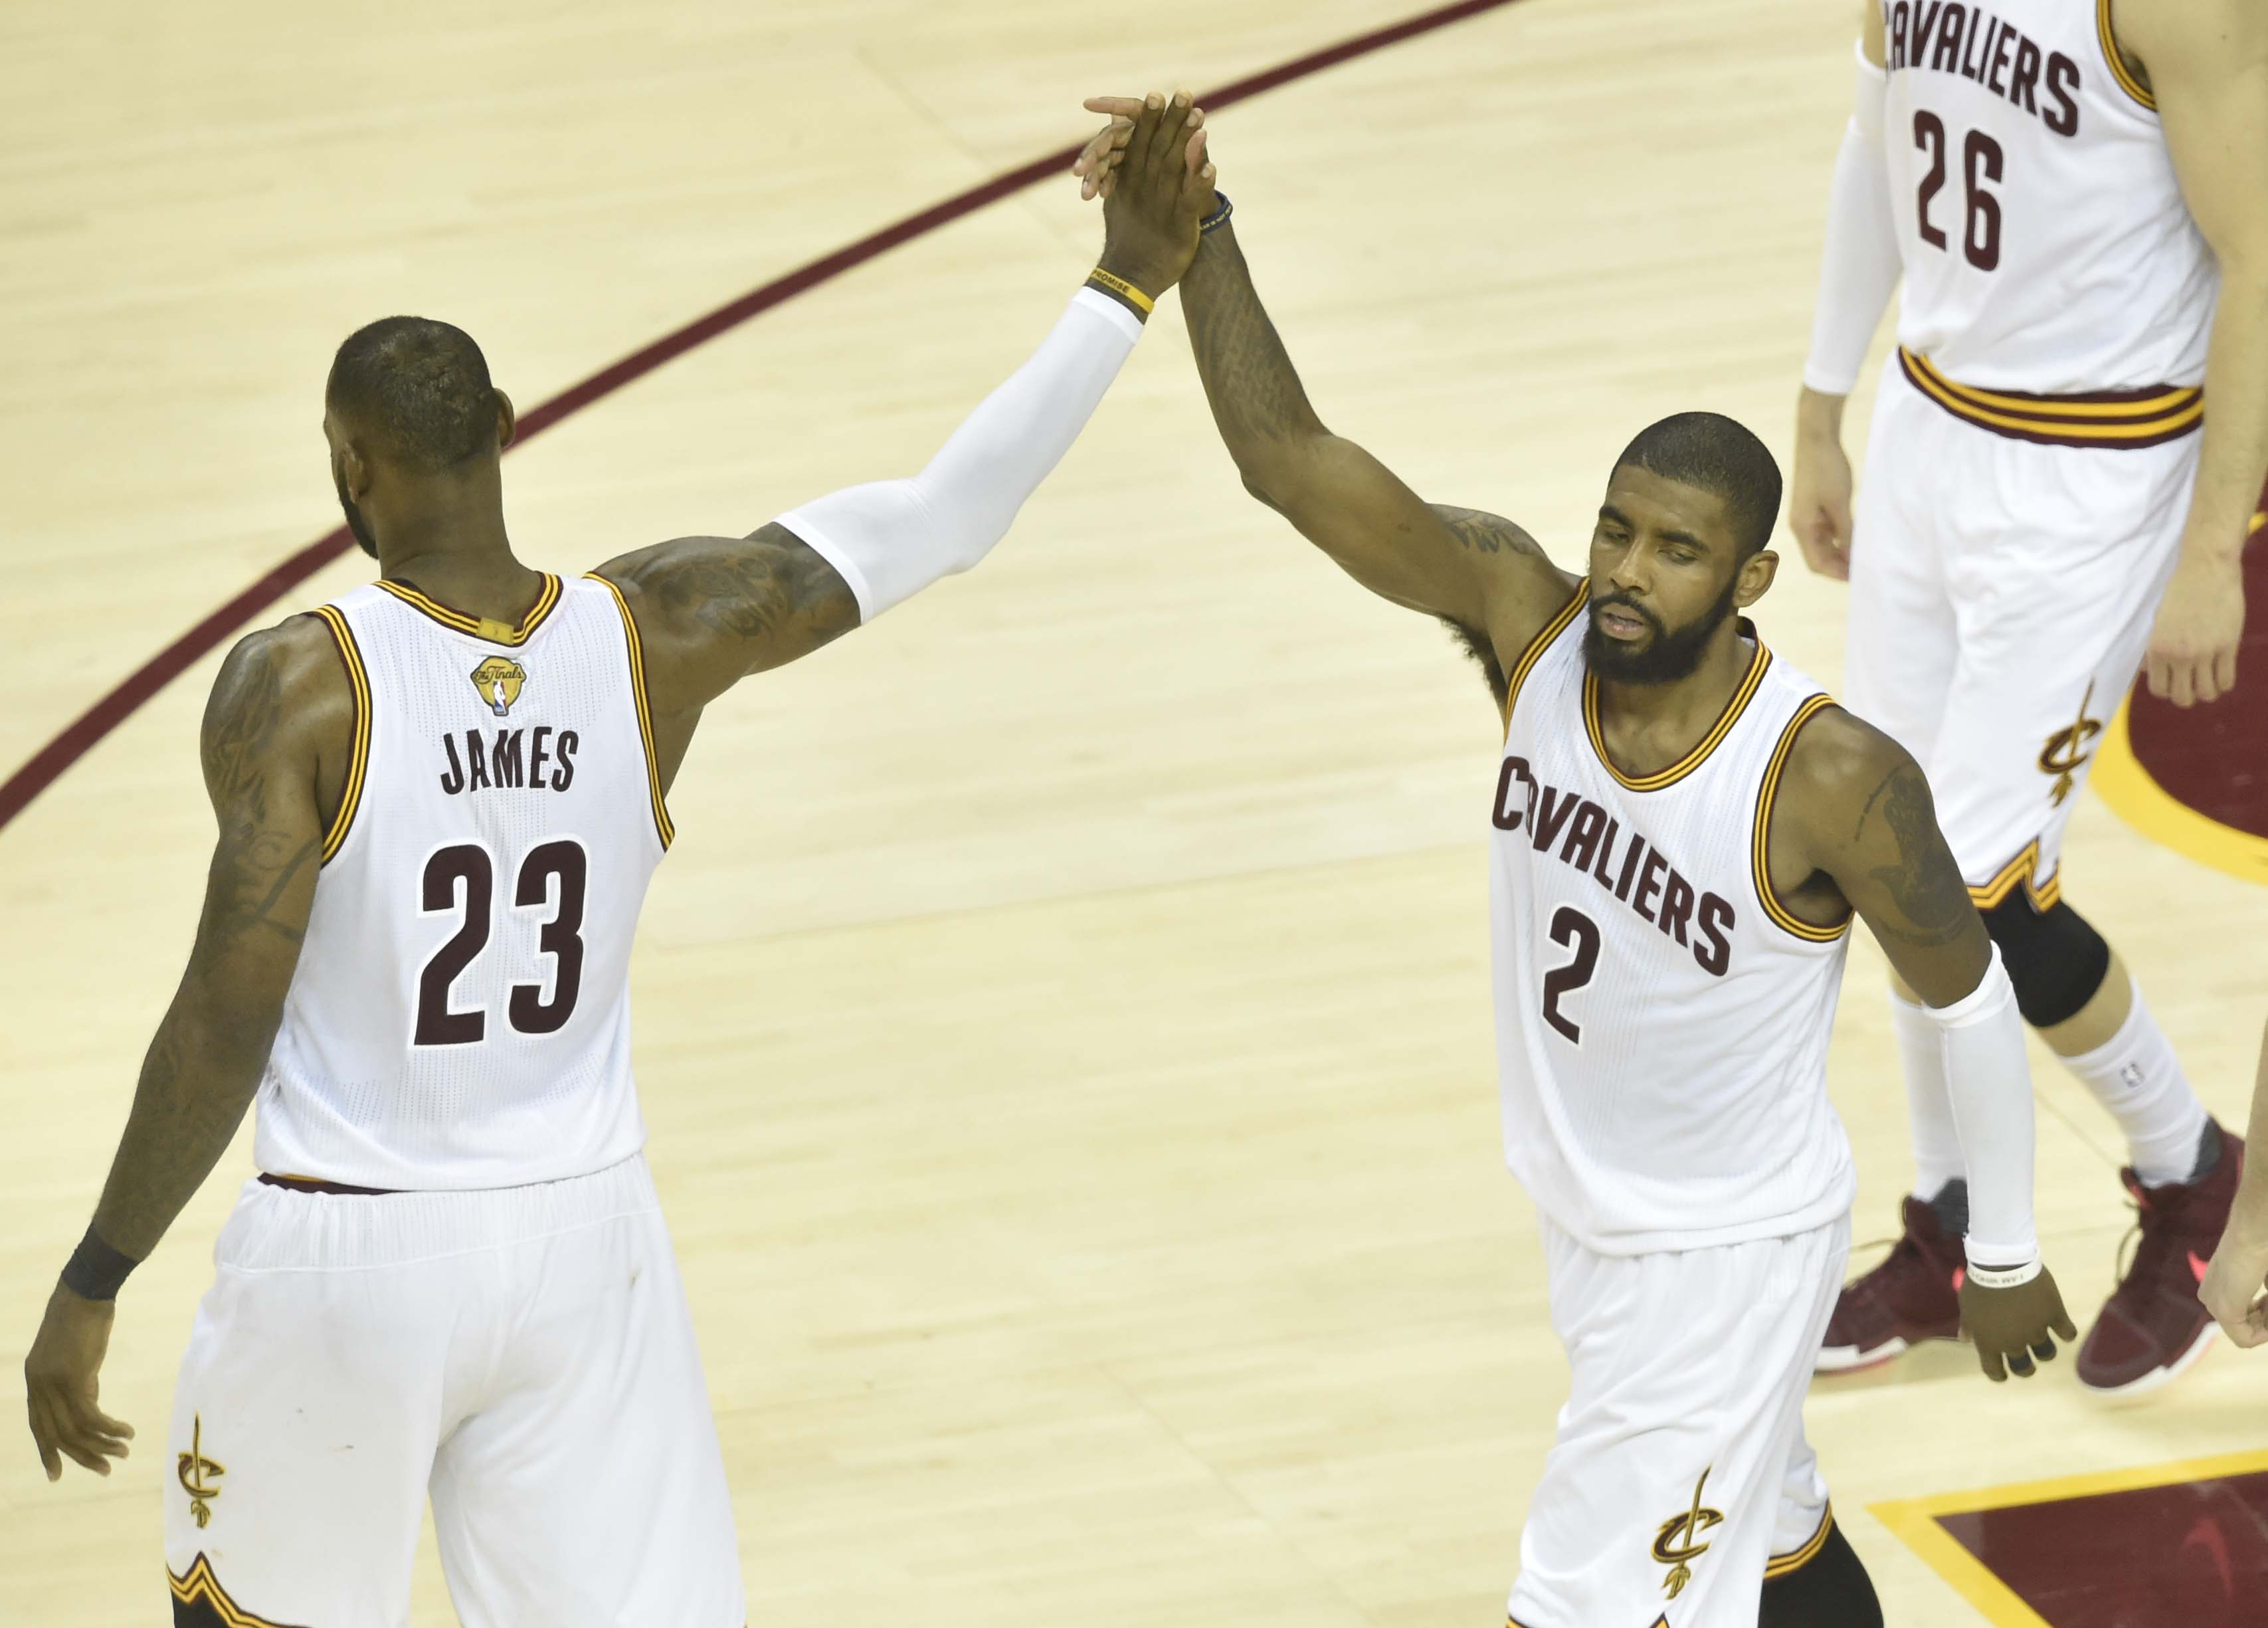 2016 Nba Playoffs Odds Warriors Cavaliers Are Finals   All ...